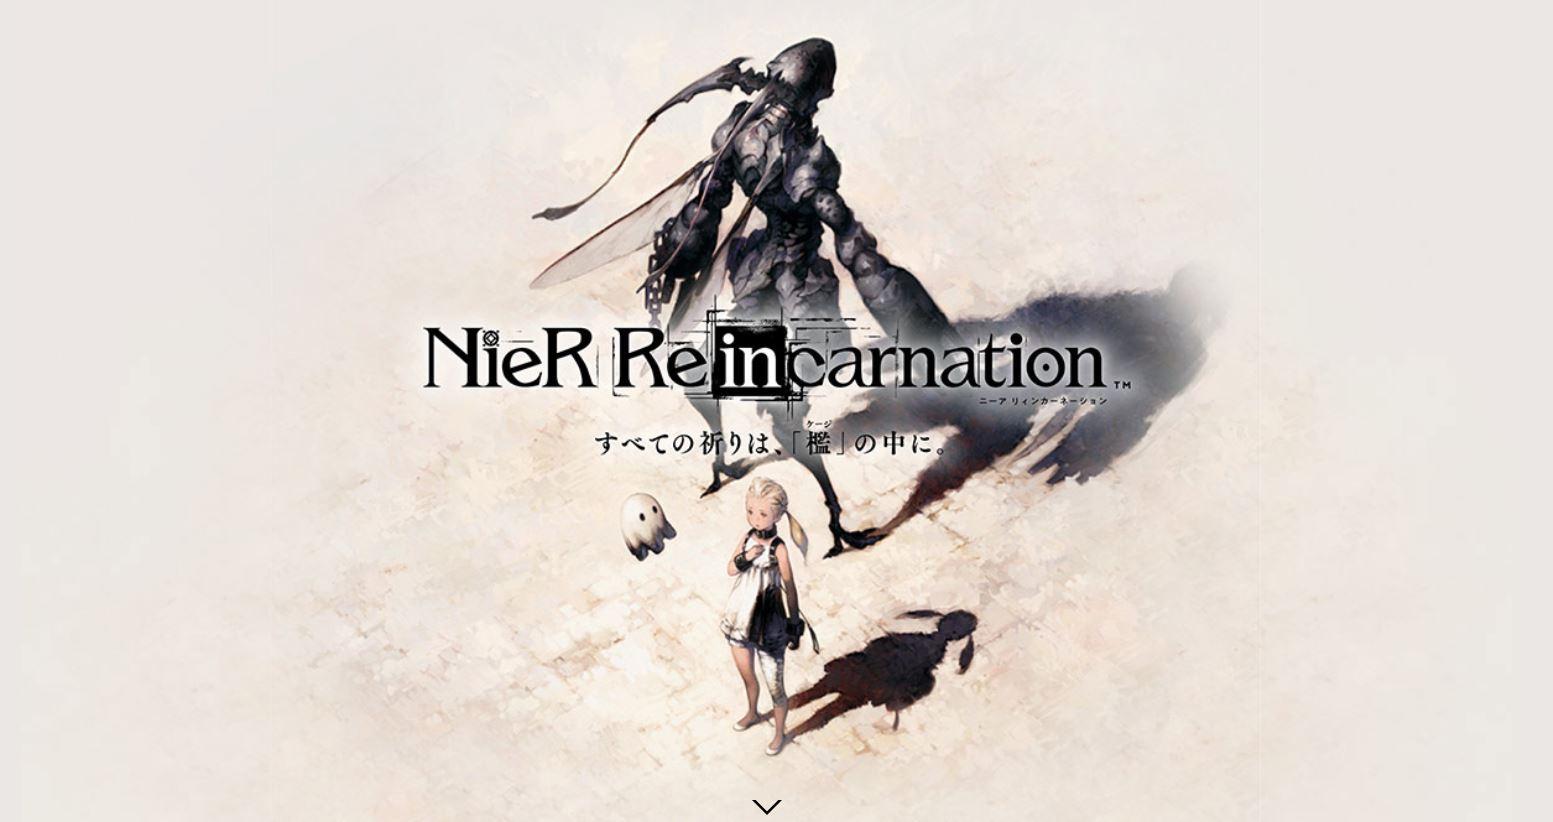 NieR Reincarnation 1372020 1 1